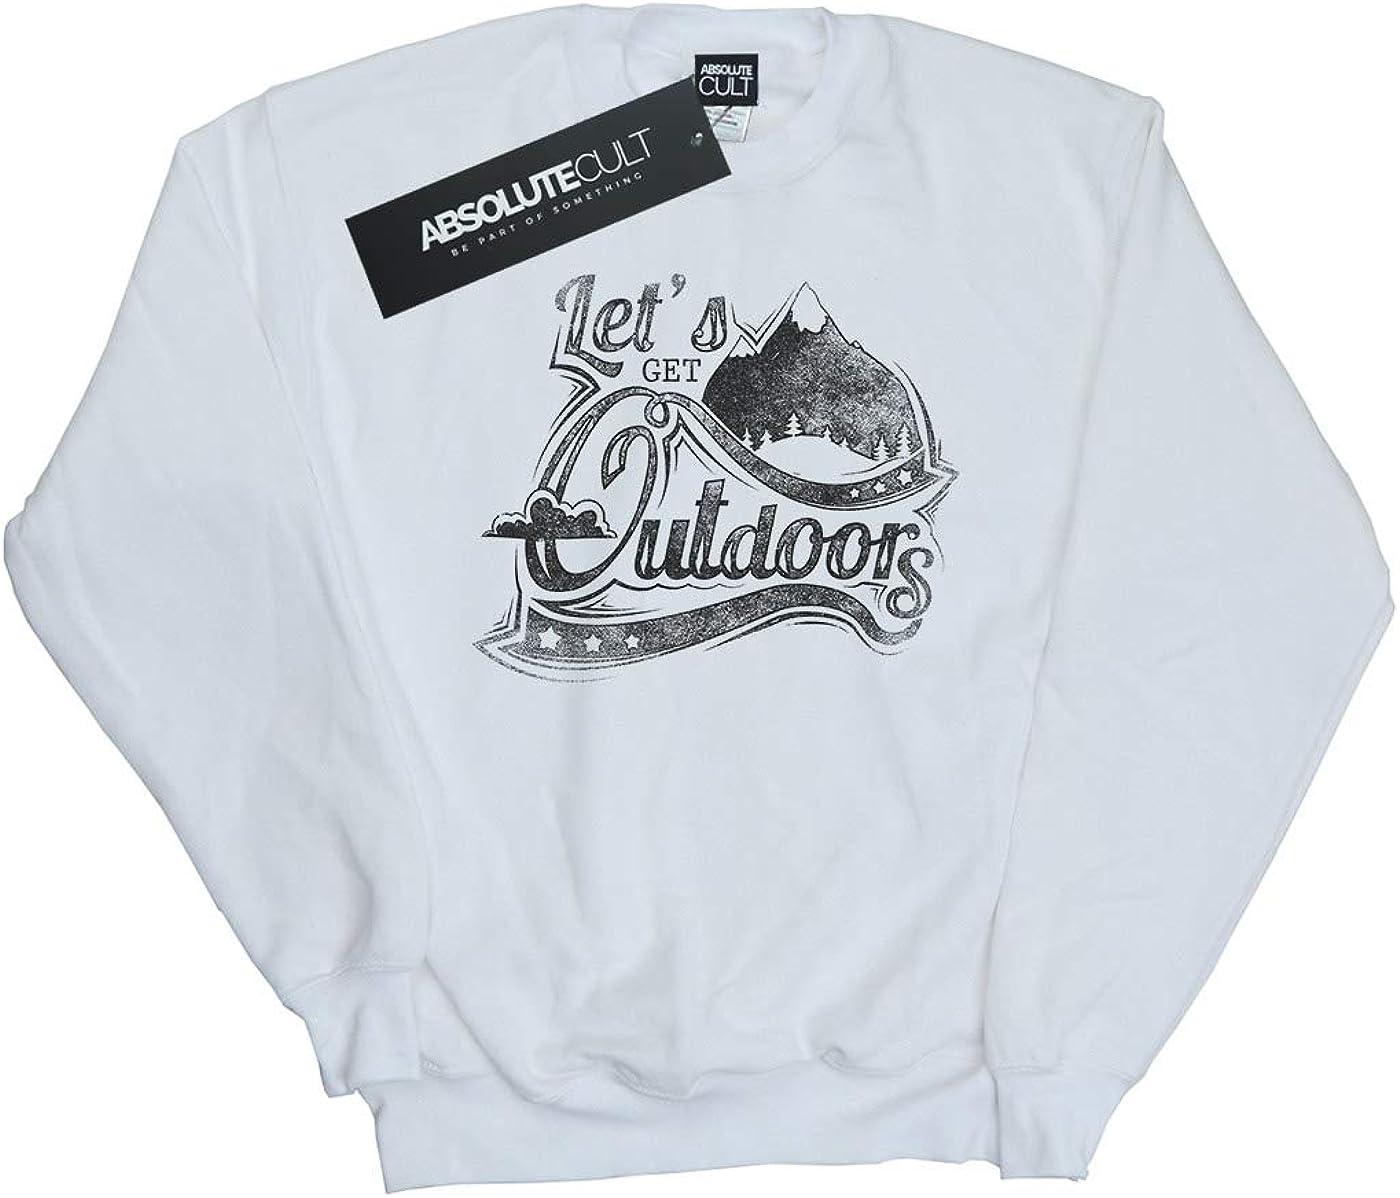 Absolute Cult Drewbacca Girls Lets Get Outdoors Sweatshirt